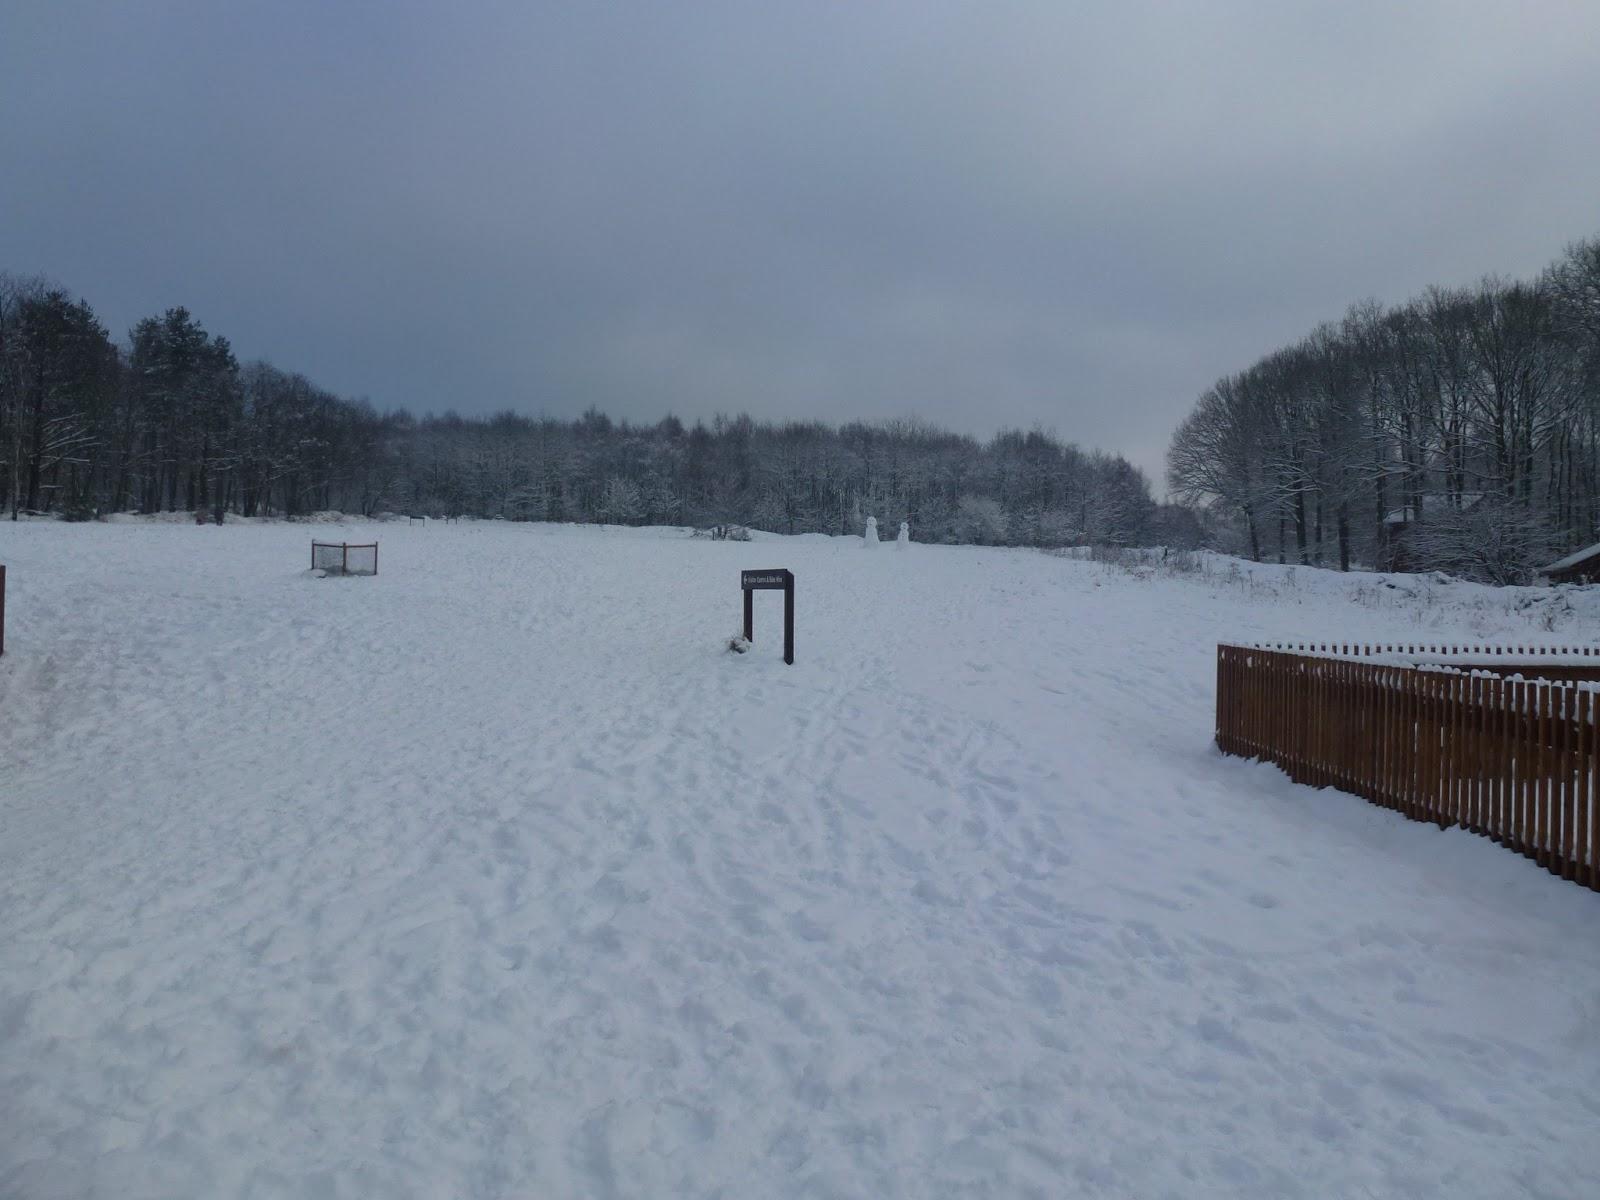 sherwood-pines-snow